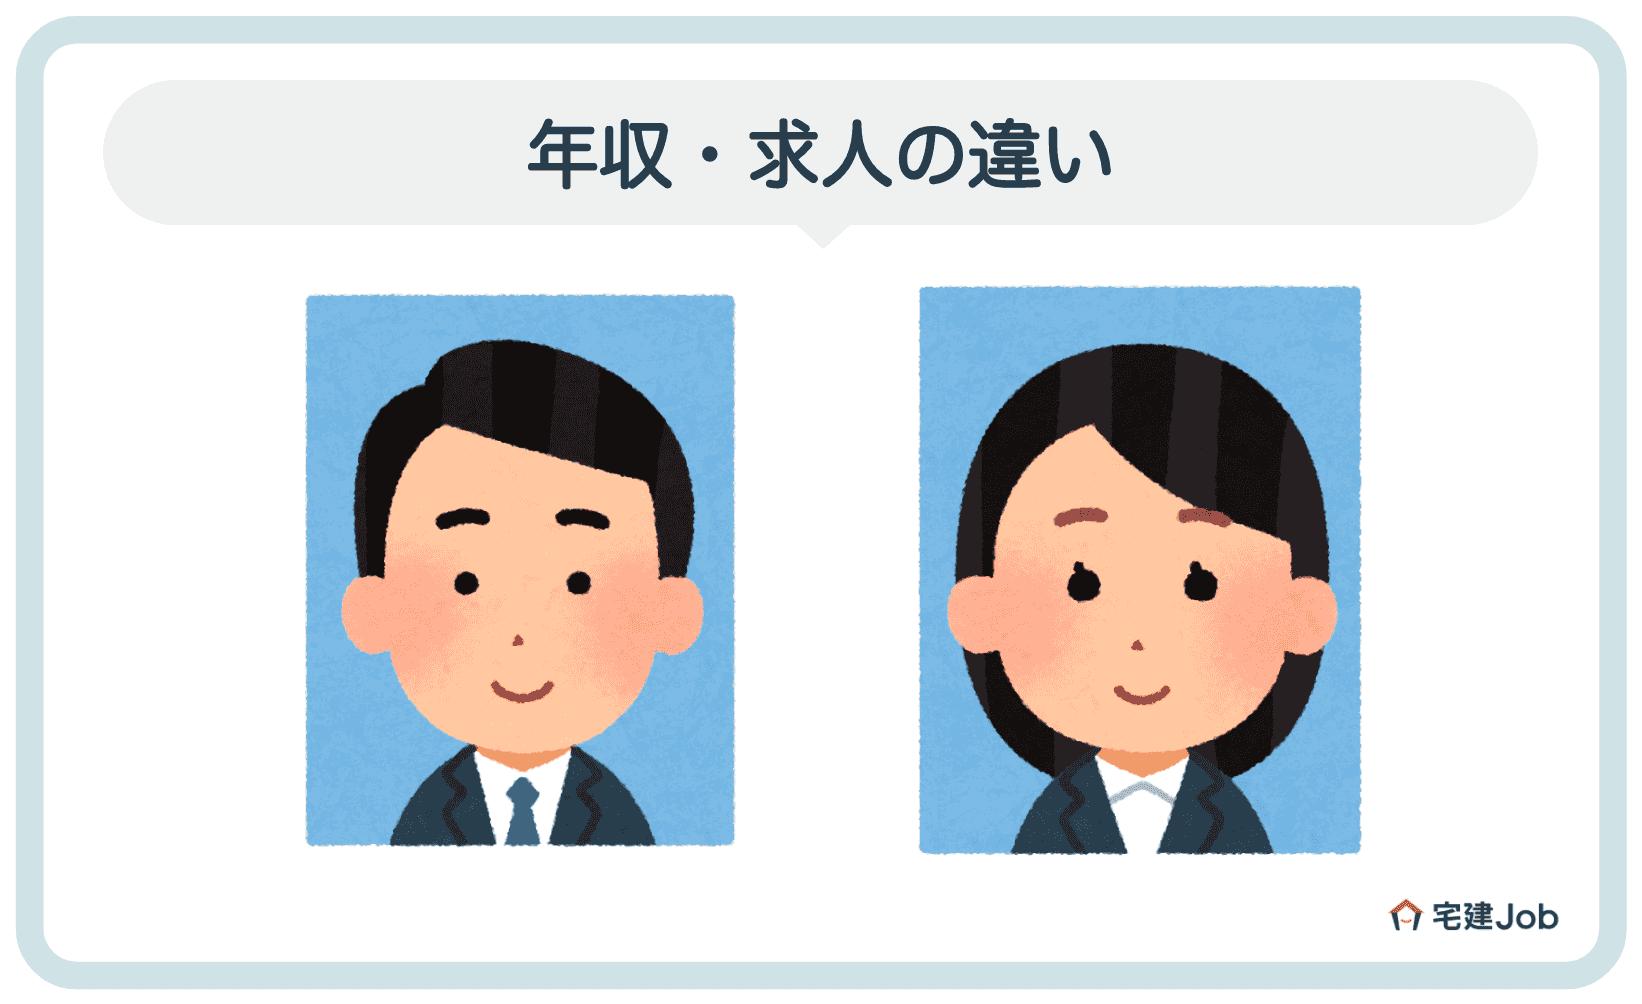 3.不動産鑑定士と土地家屋調査士の違い【年収・求人】